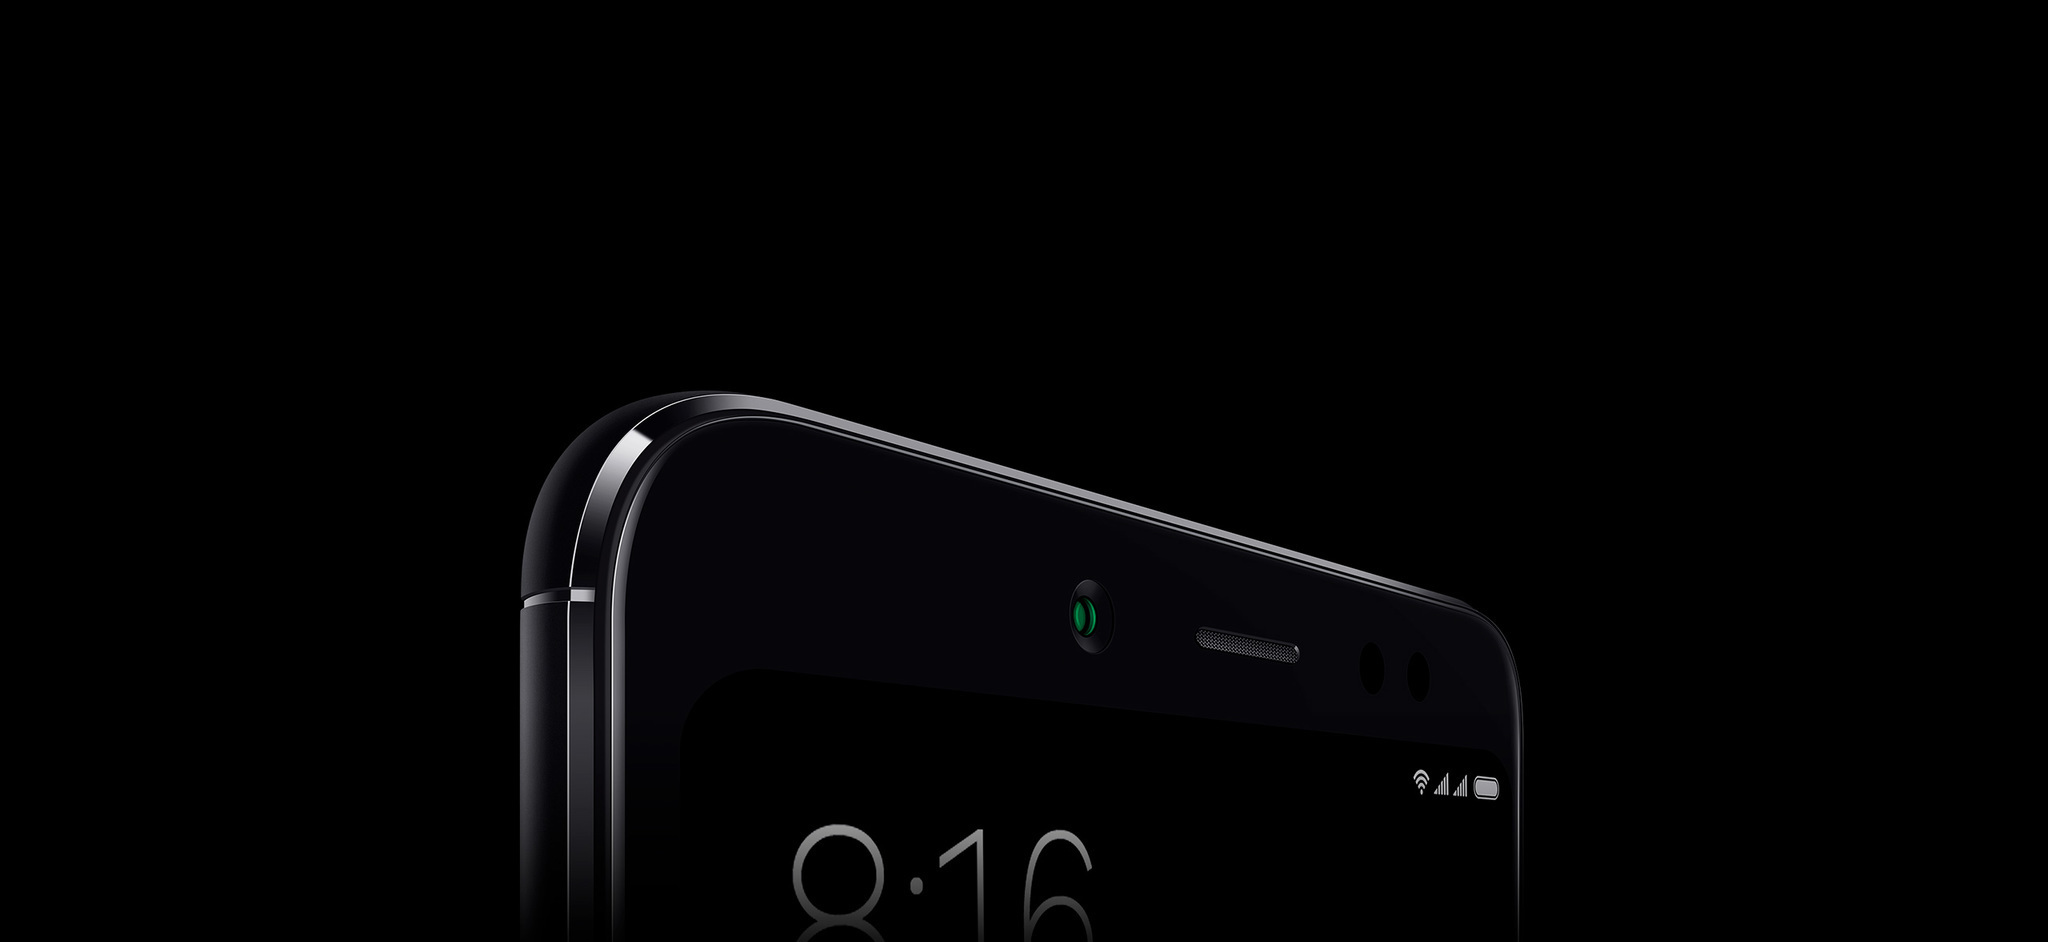 Xiaomi redmi note 5 нет подсветки дисплея